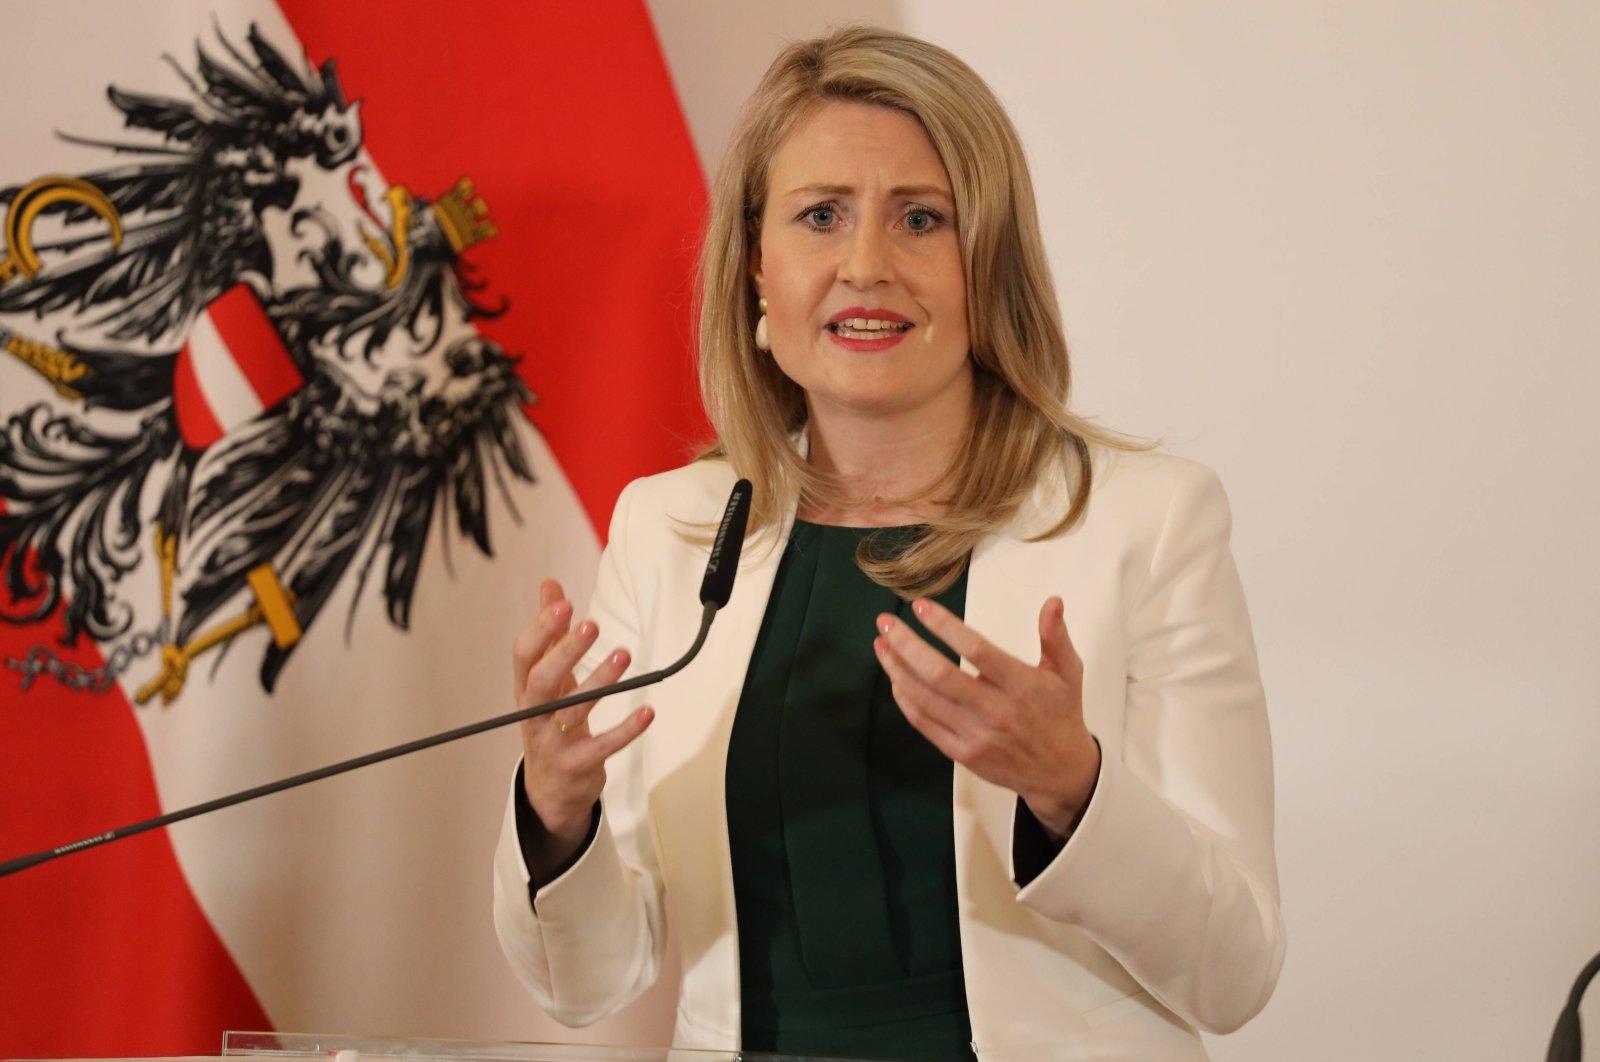 Austrian Integration Minister Susanne Raab in Vienna, Austria, March 4, 2020. (Reuters Photo)